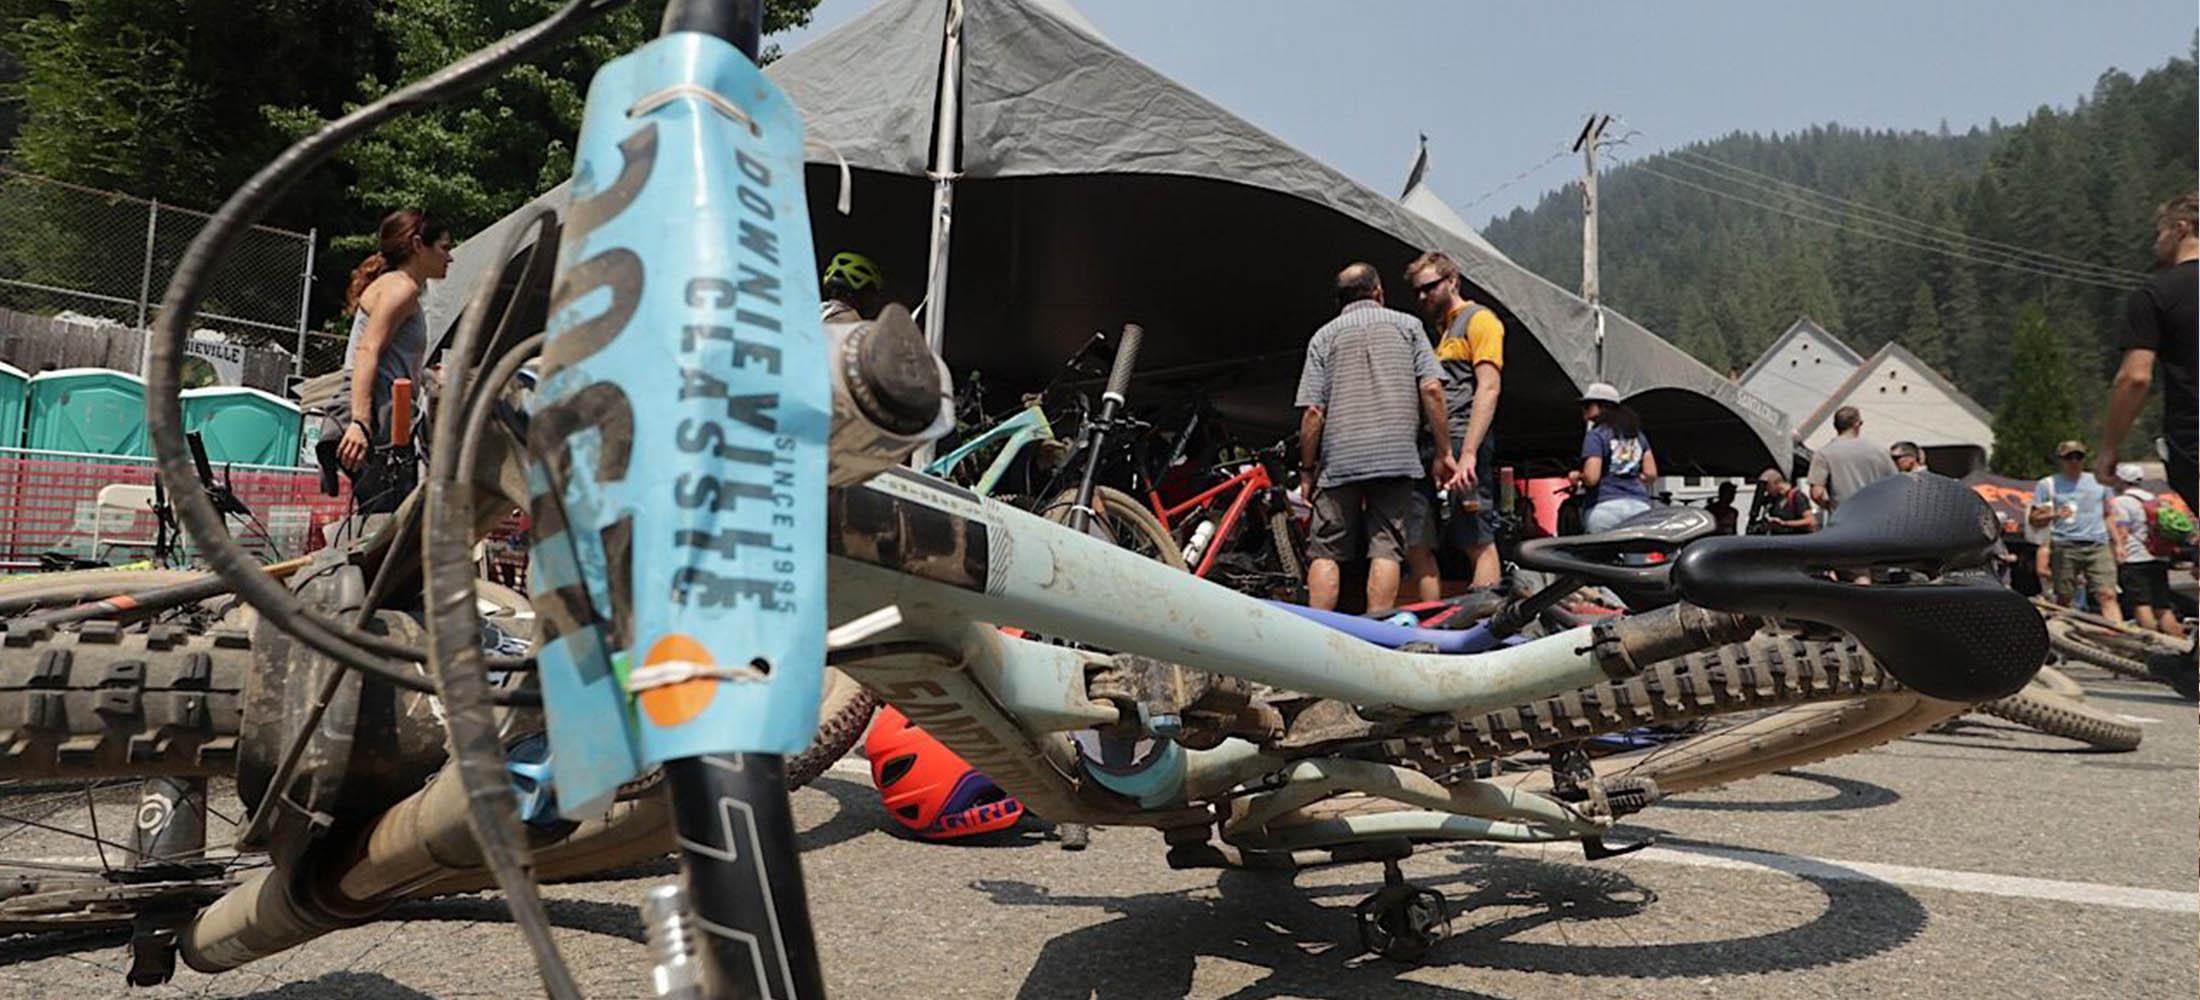 Events We Sponsor | Santa Cruz Bicycles - Stage Races Around